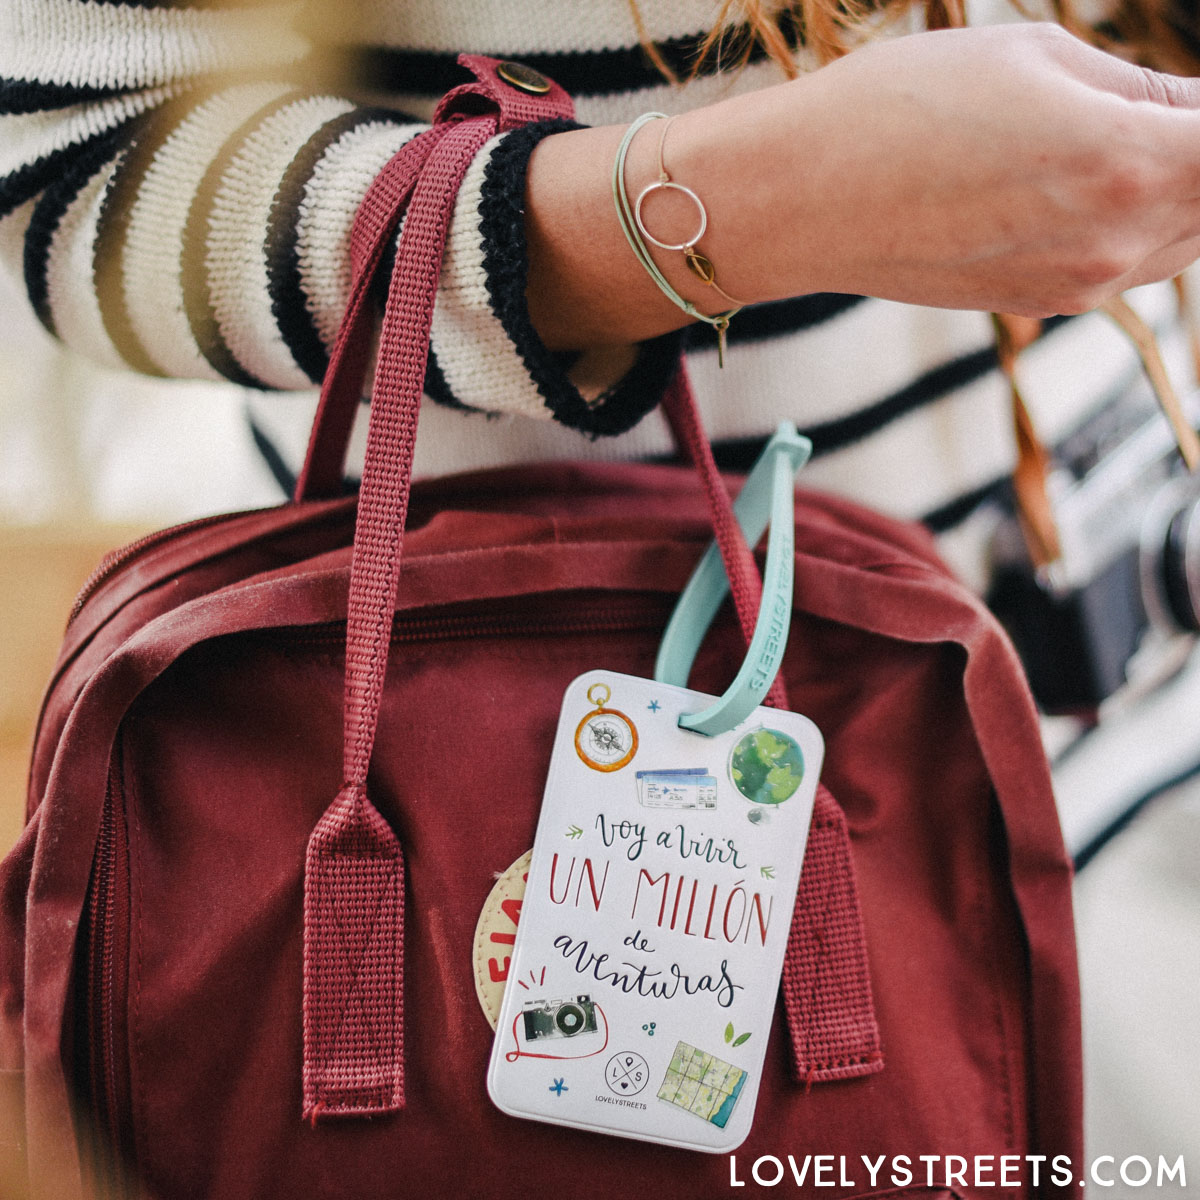 lovelystreets_etiqueta-para-equipaje-01_etiqueta-para-equipaje-lovelystreets-vivir-millon-aventuras-2